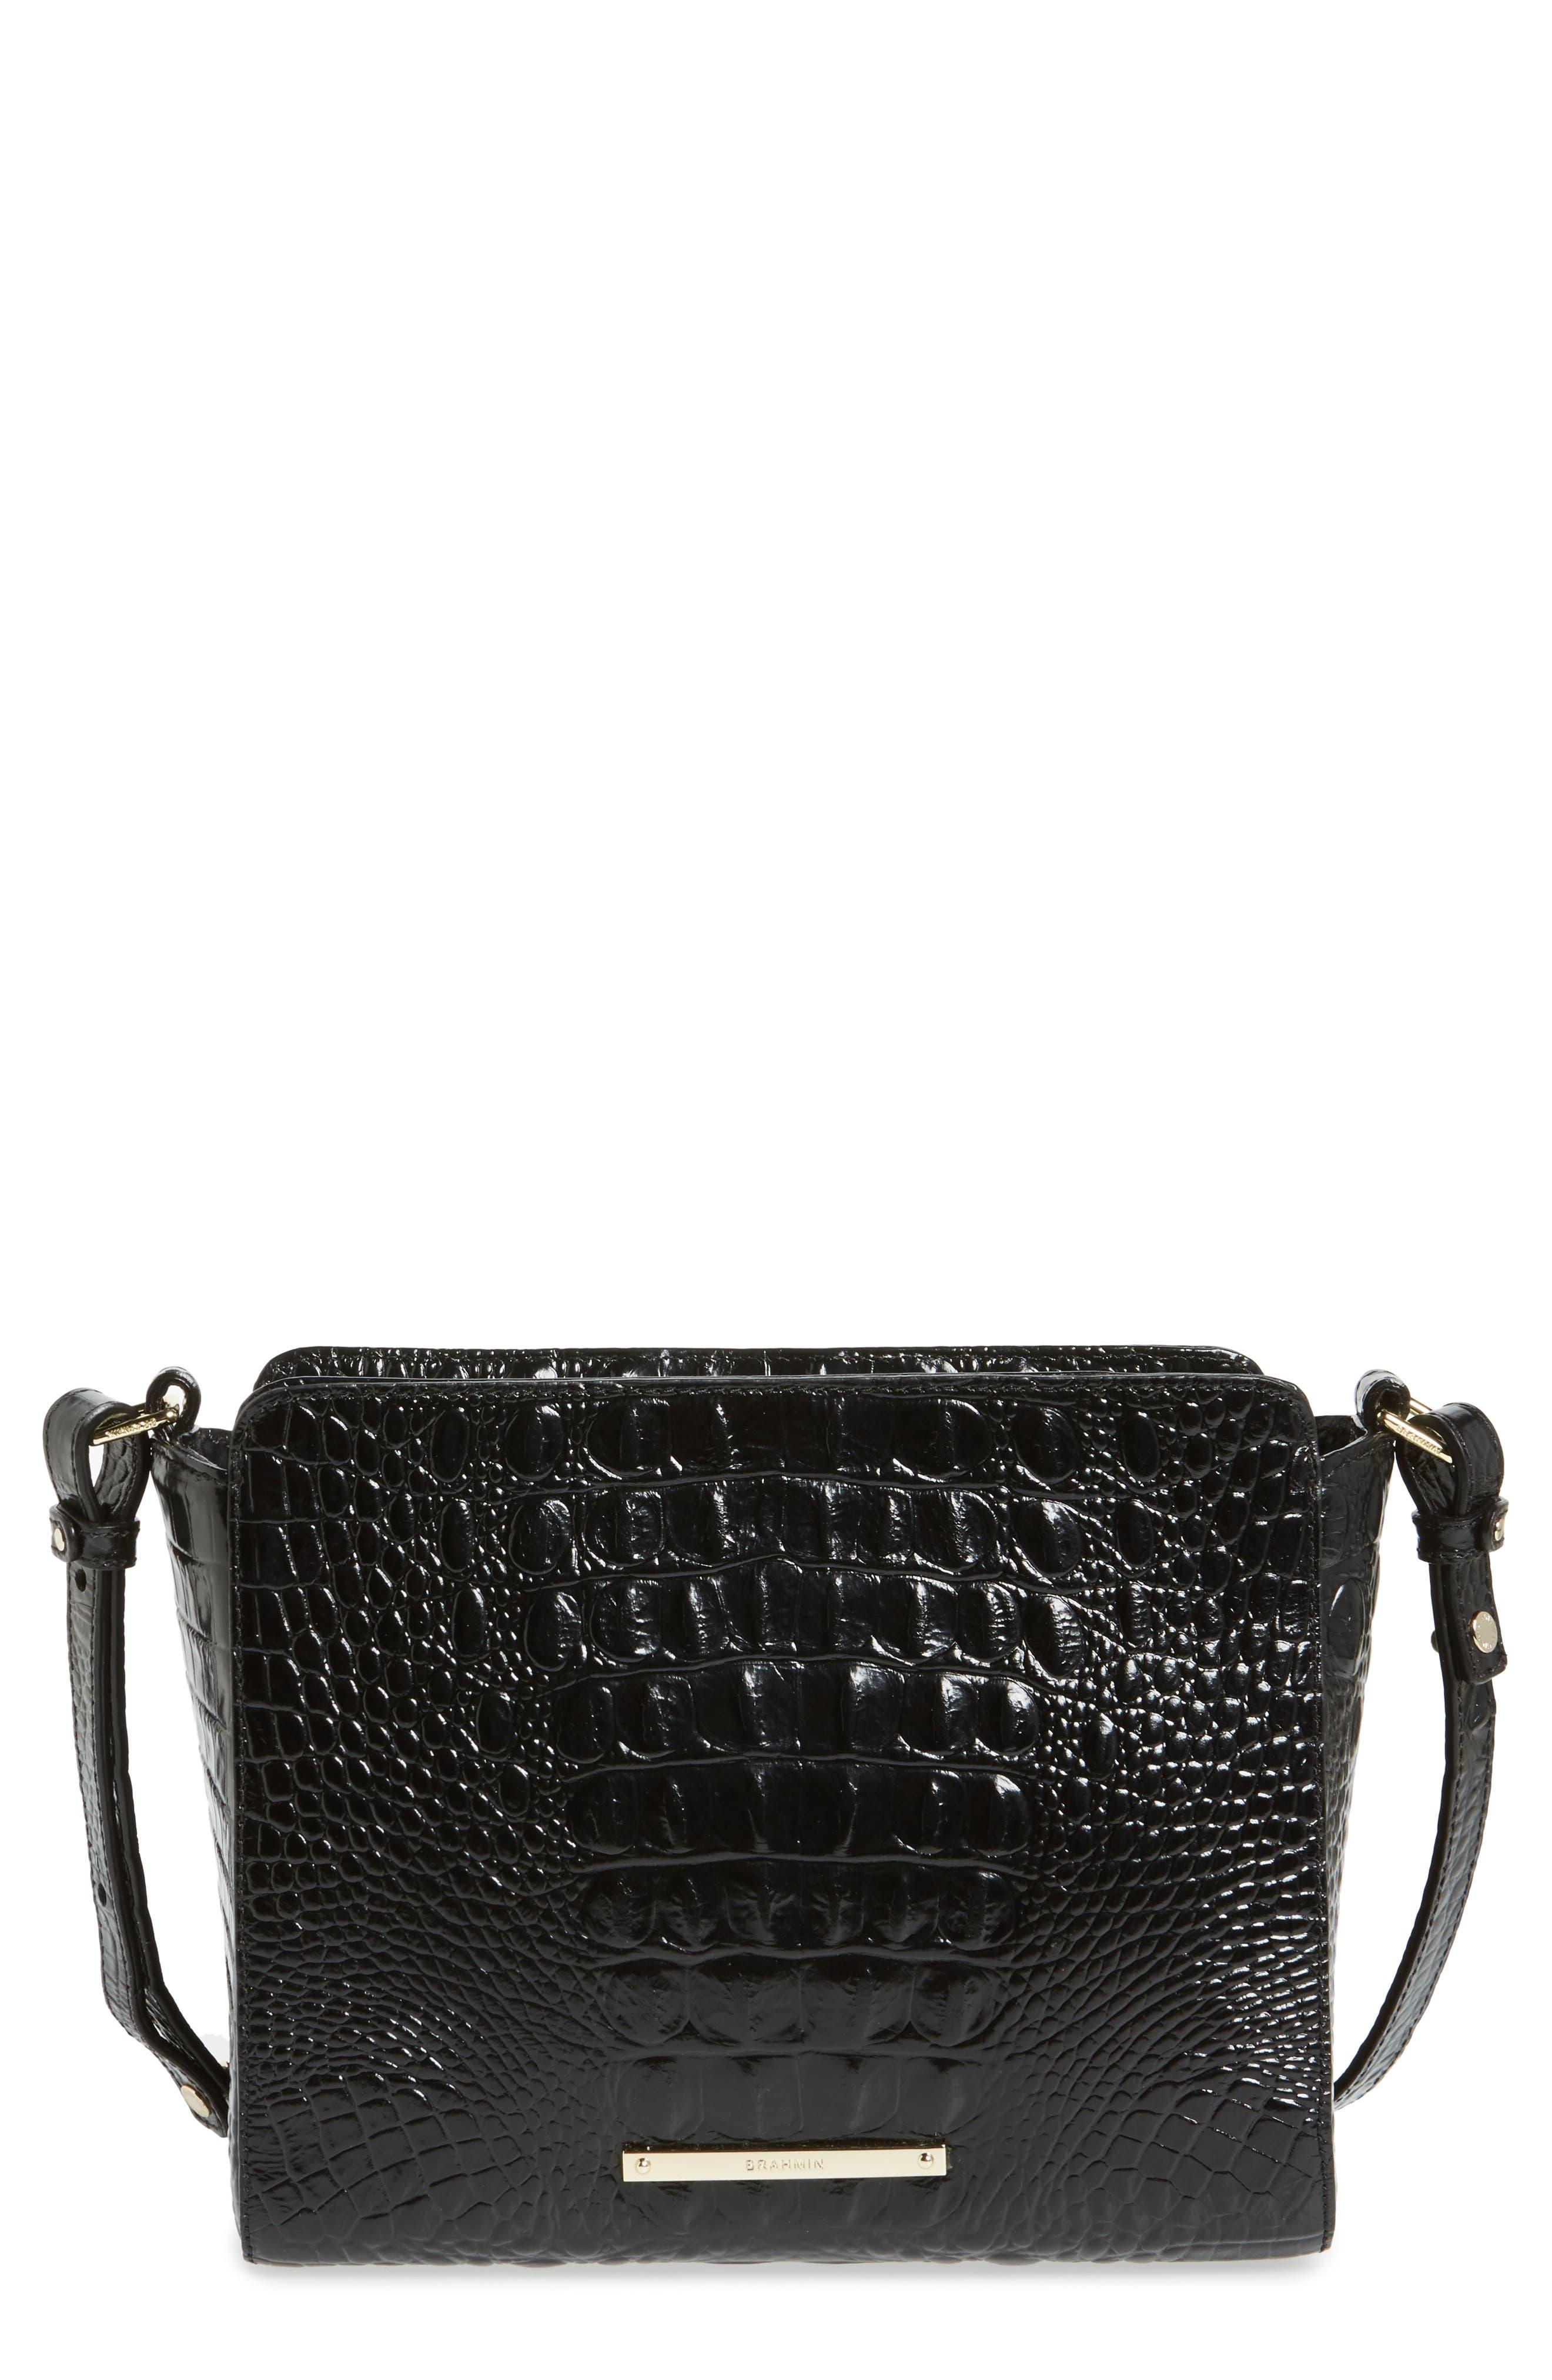 Melbourne Carrie Leather Crossbody Bag,                             Main thumbnail 1, color,                             Black